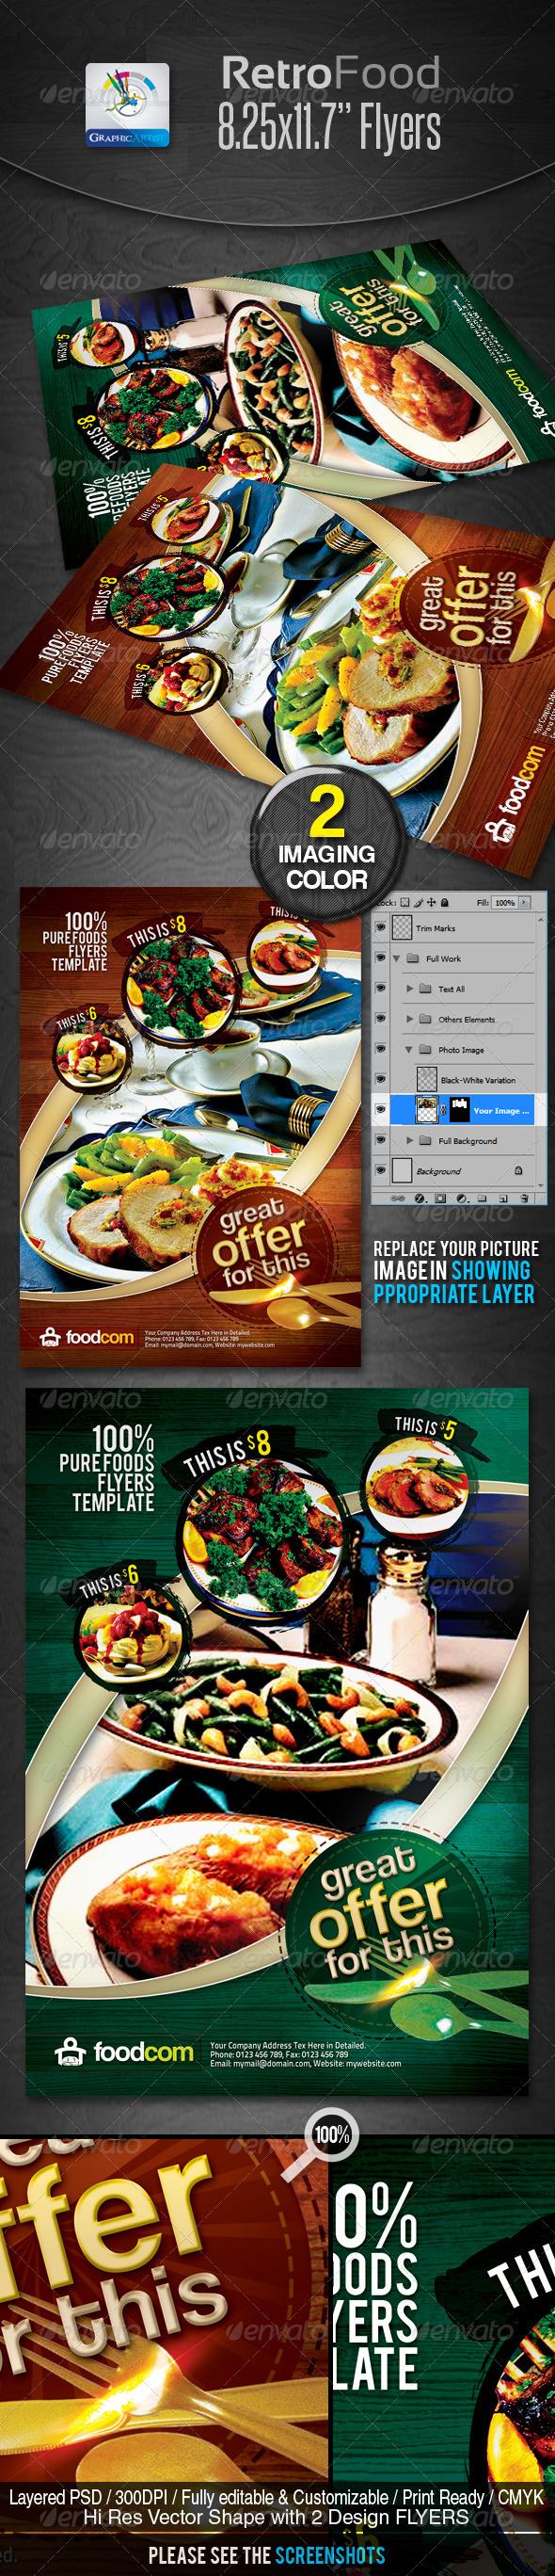 Retro Restaurant Food Flyers - Restaurant Flyers